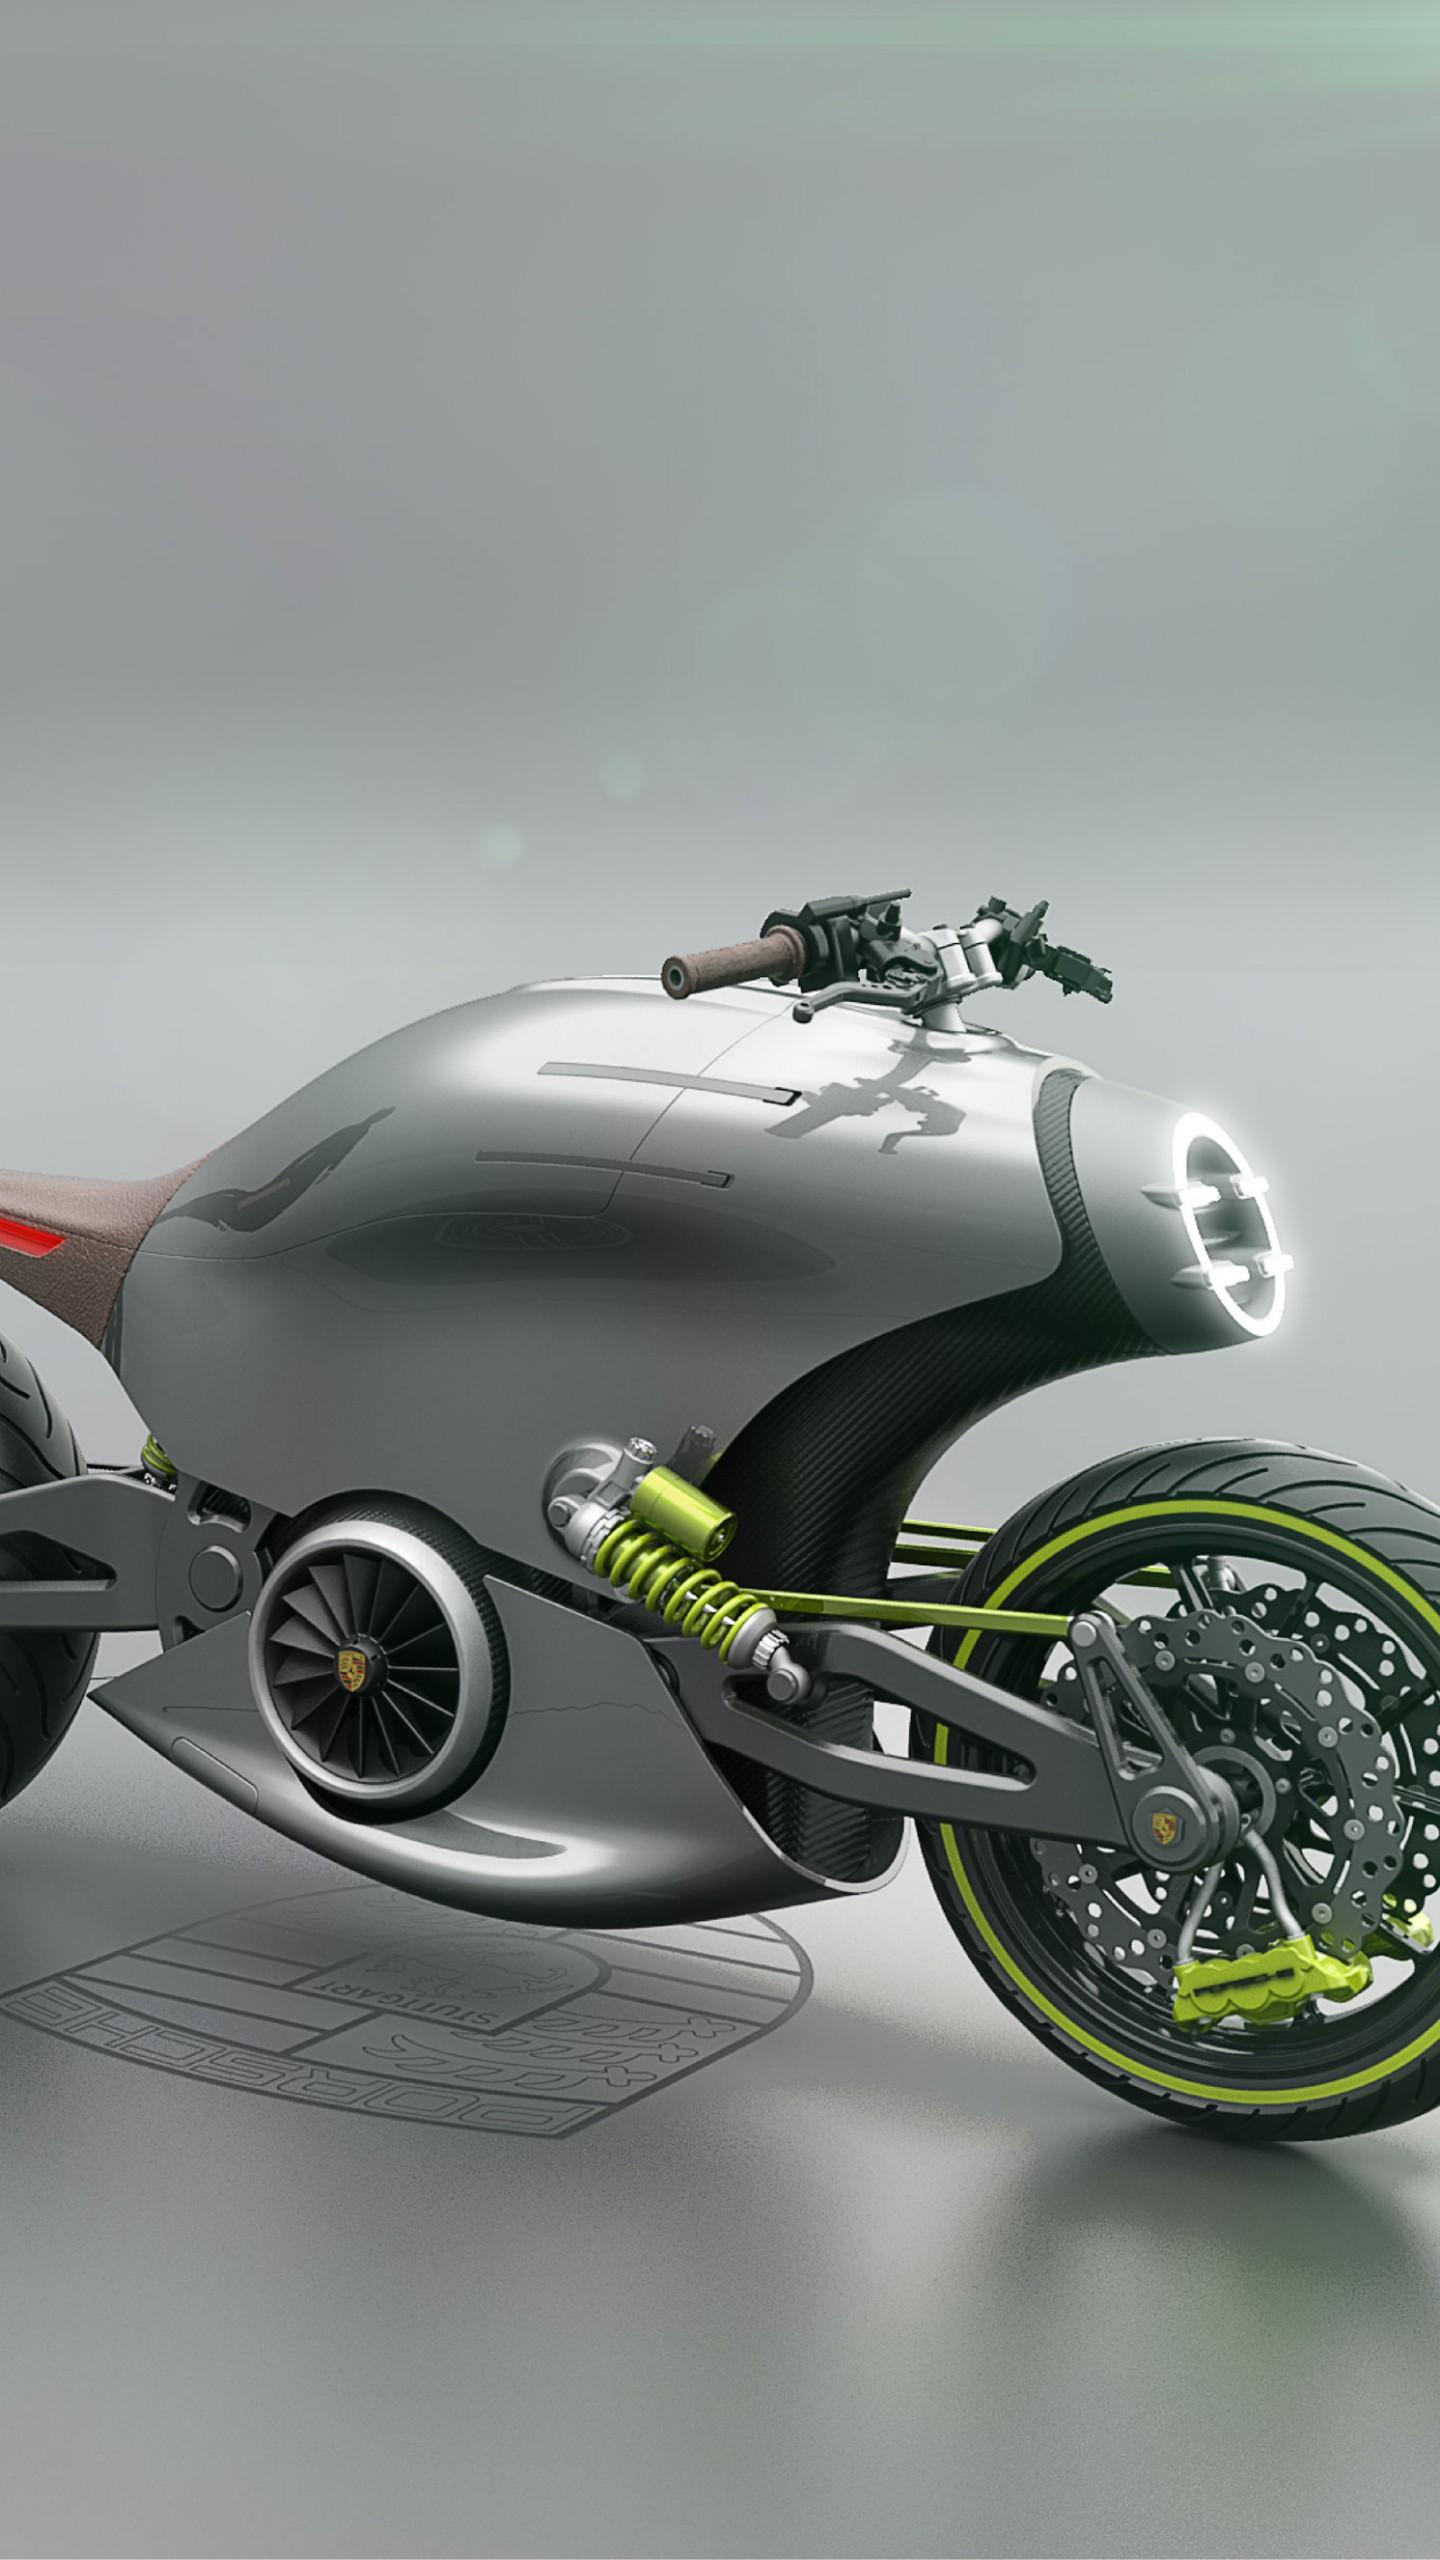 Hd Wallpaper Of Girls Wallpaper Porsche 618 Electric Motorcycle 4k Cars